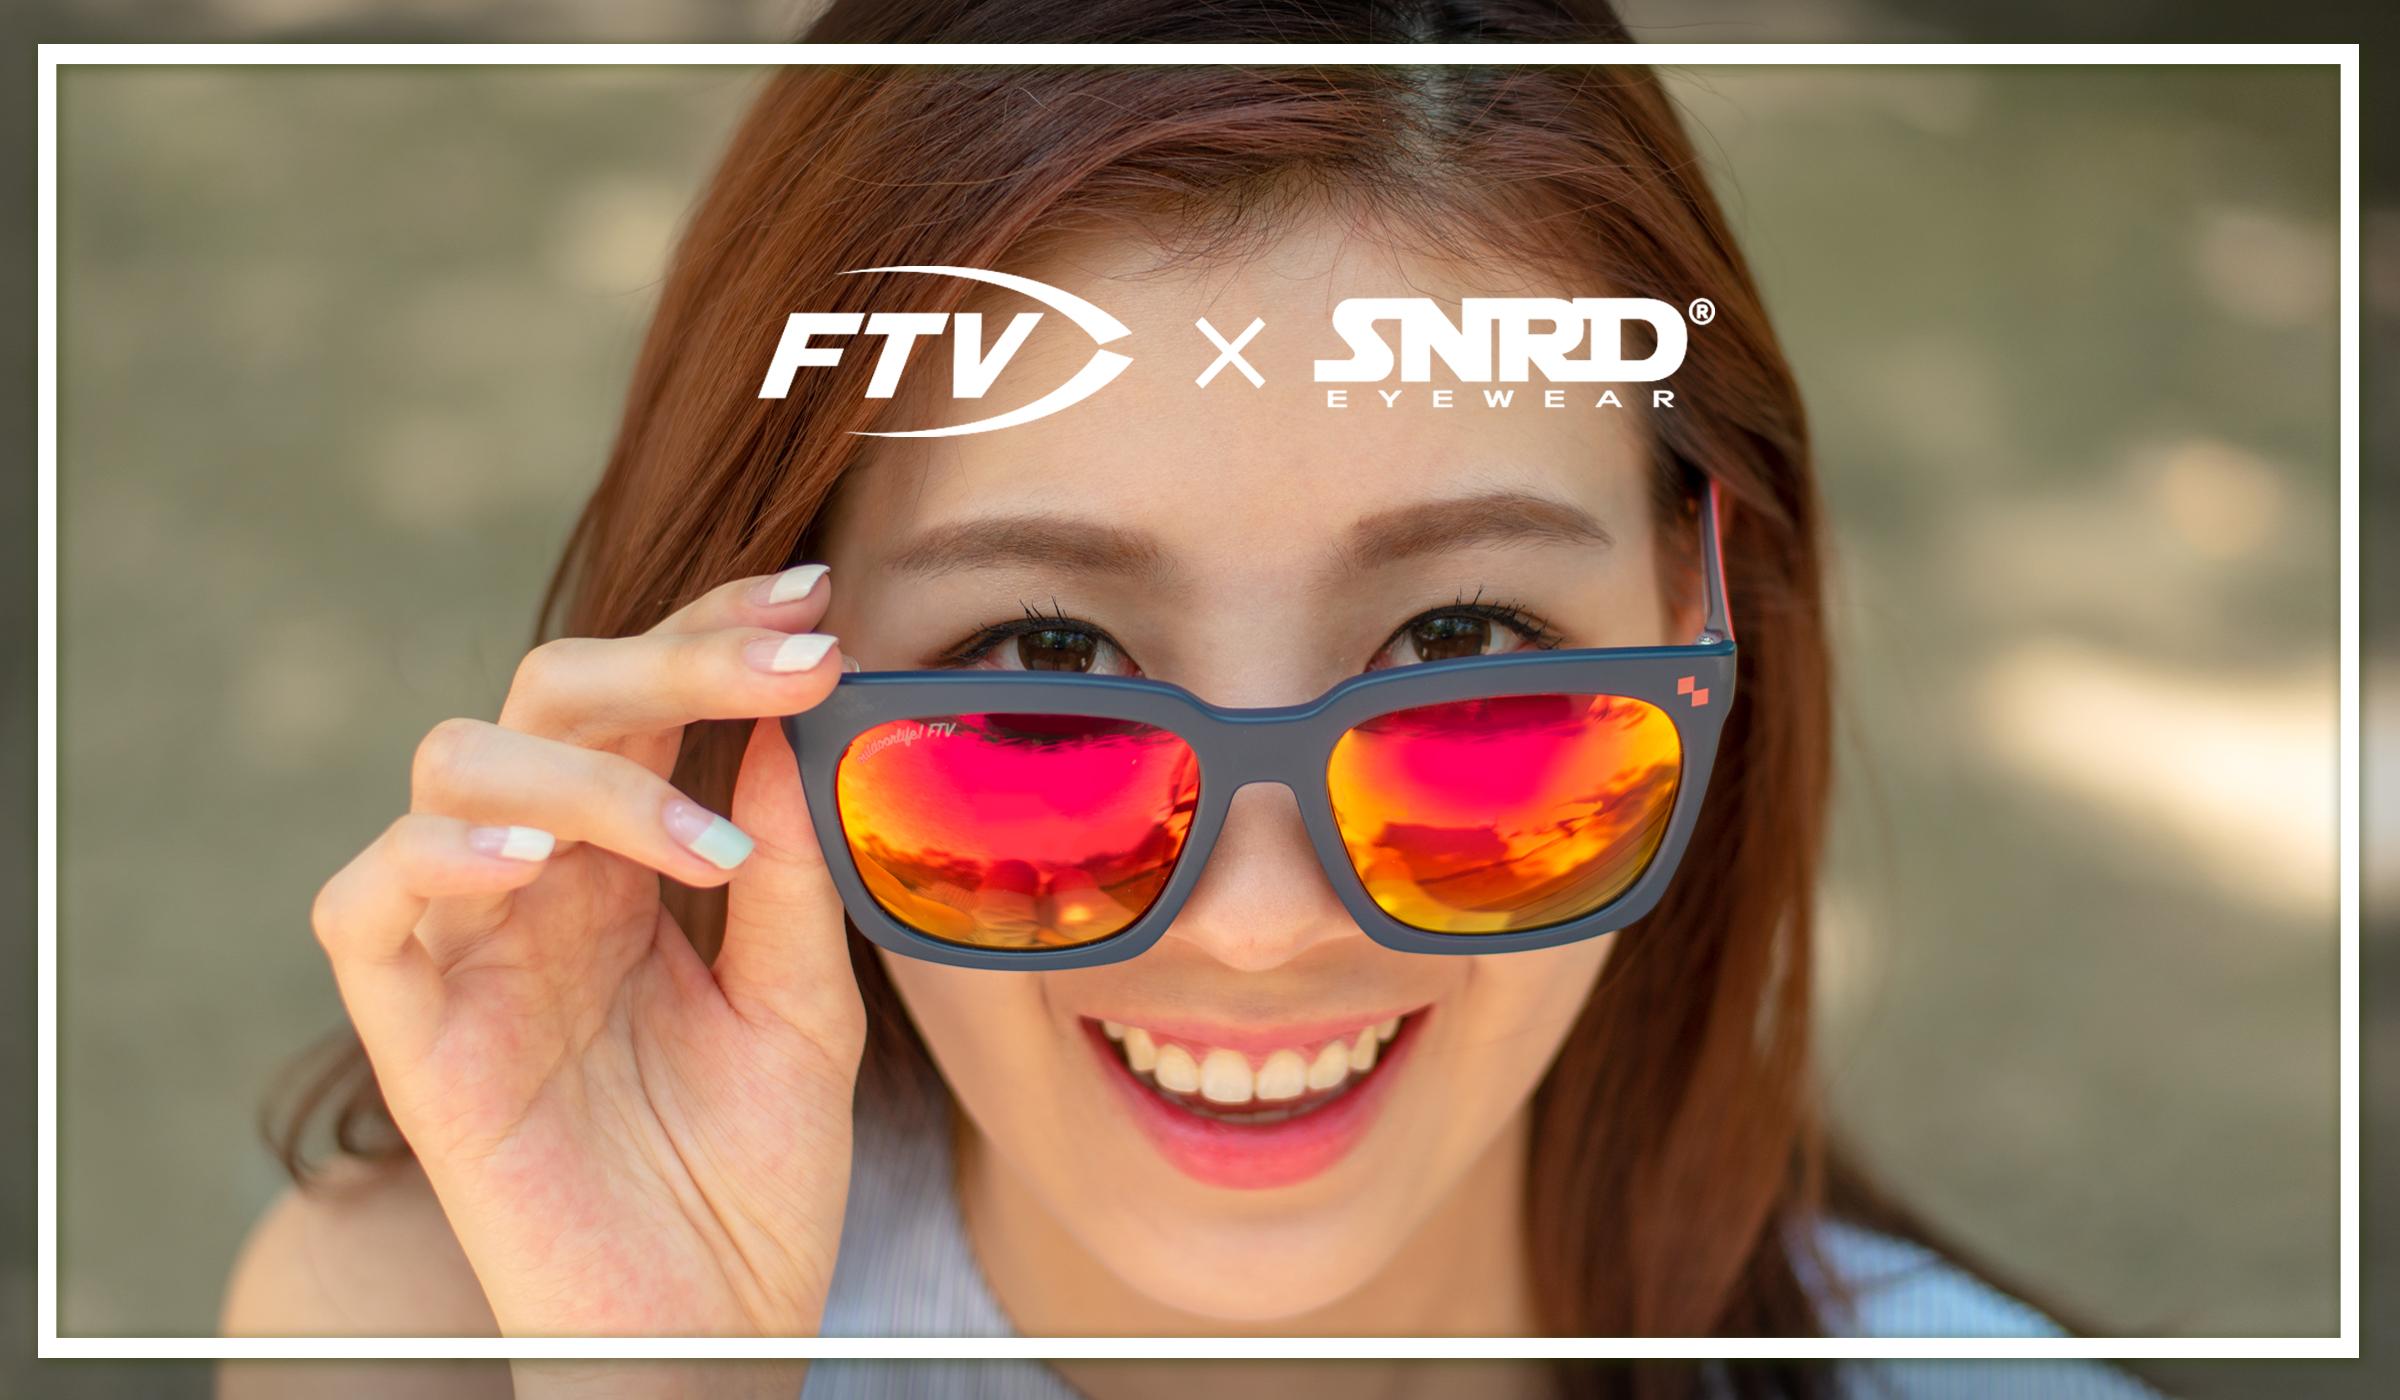 FTV×SNRD 리미티드 에디션 기능성 패션 선글라스 출시...낚시 마니아에게 인기 예상